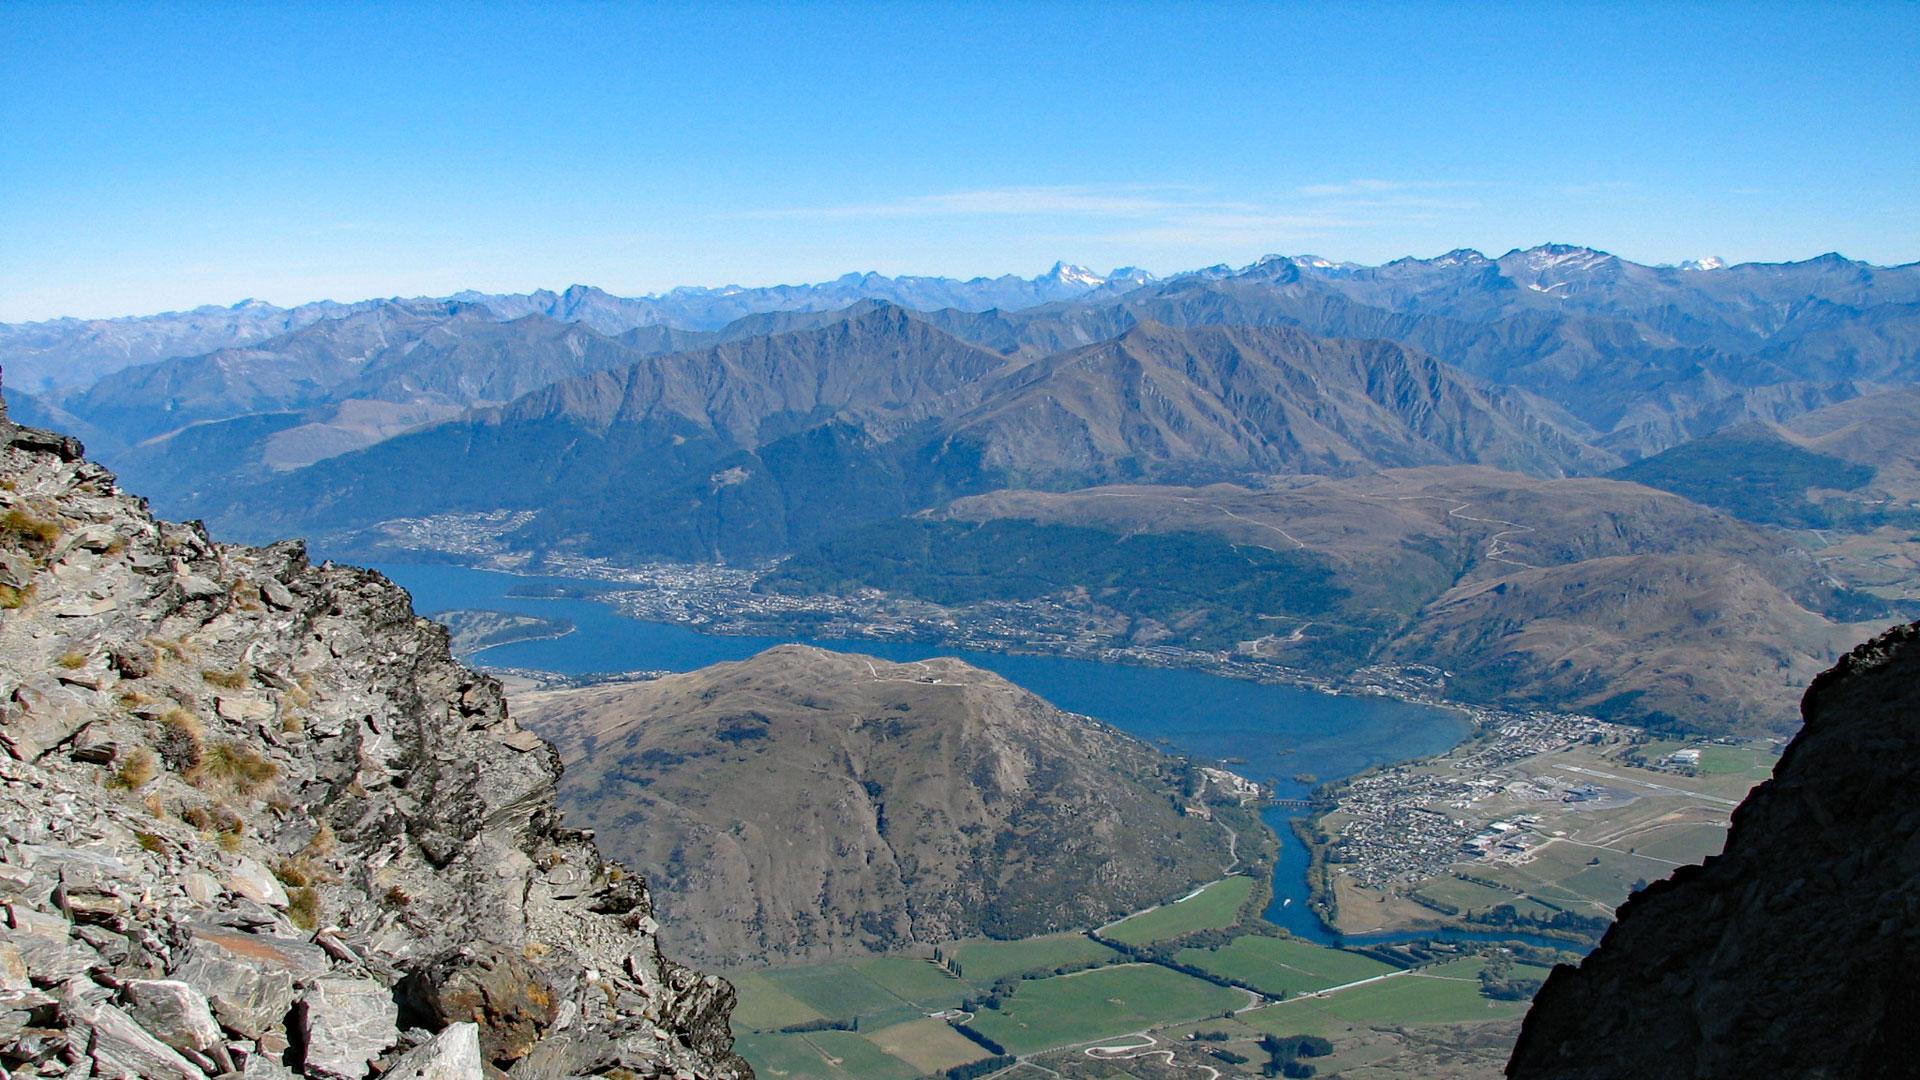 Tanken Tours | ニュージーランド南島クイーンズタウンのガイド会社